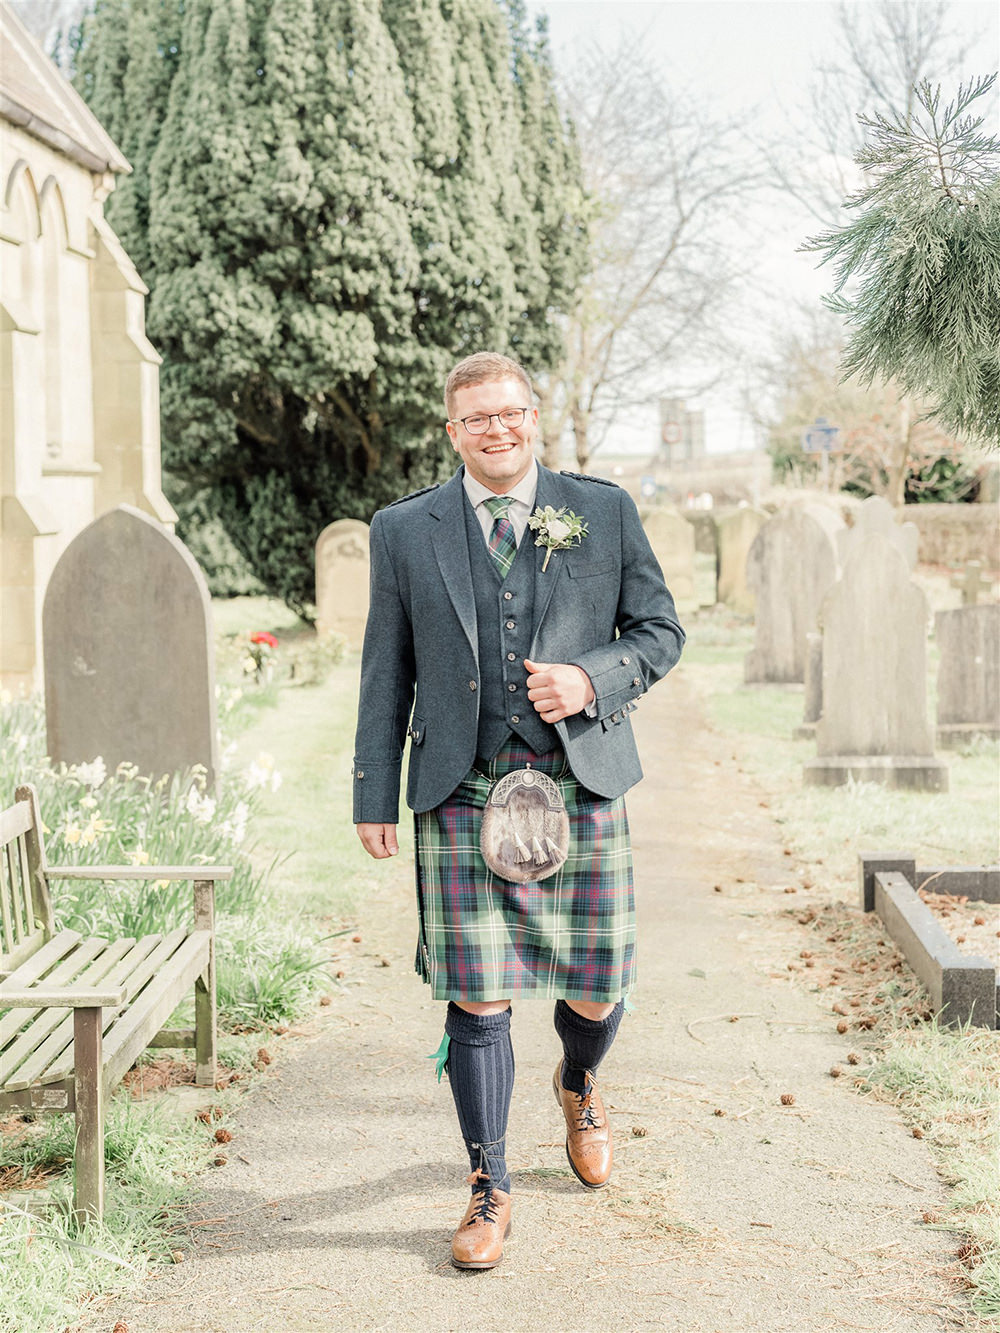 Groom Kilt Suit Tartan Tie Buttonhole Flowers Lockdown Wedding Carn Patrick Photography